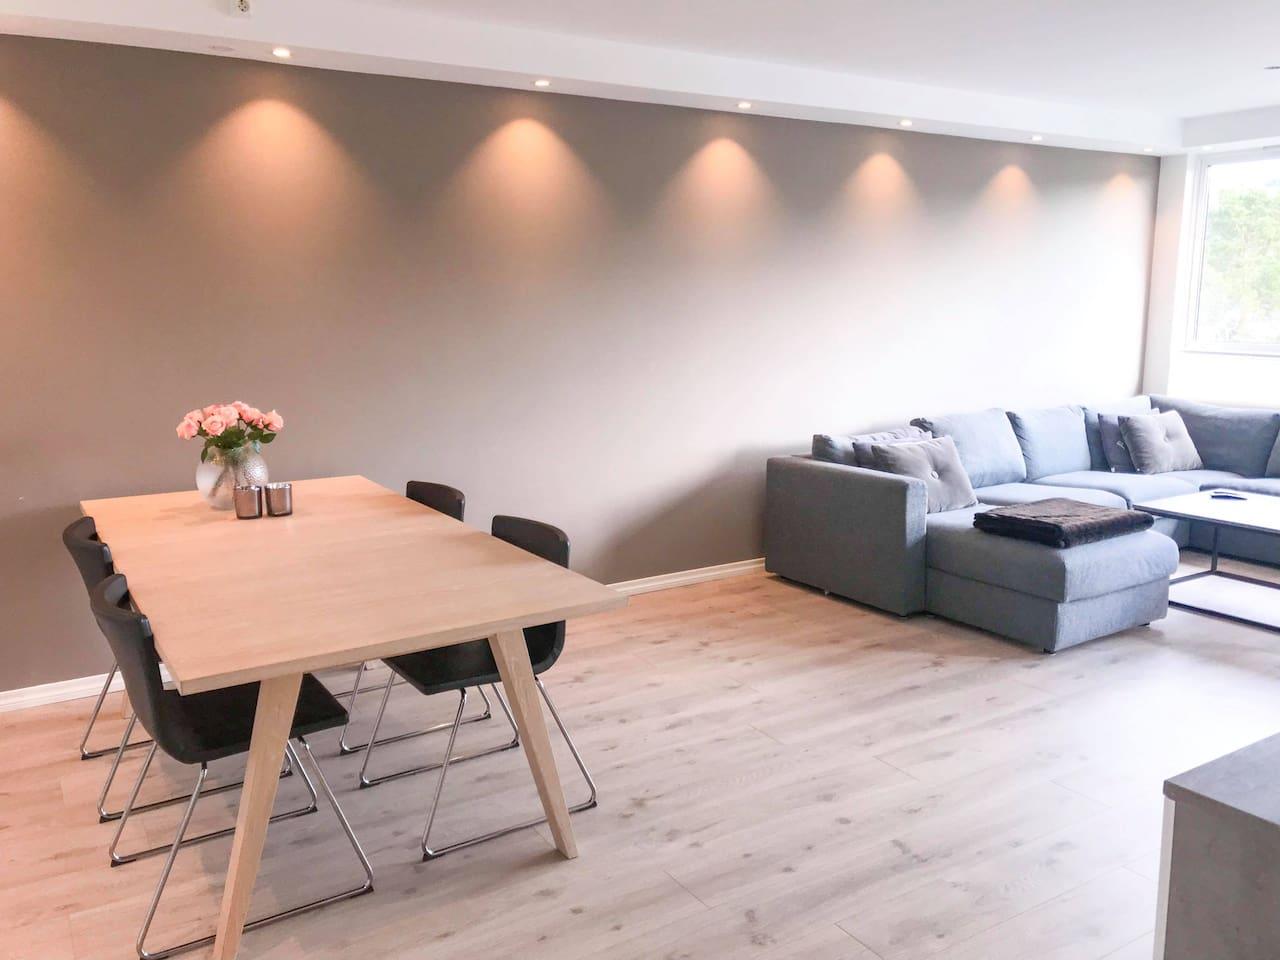 Nice and cozy living room